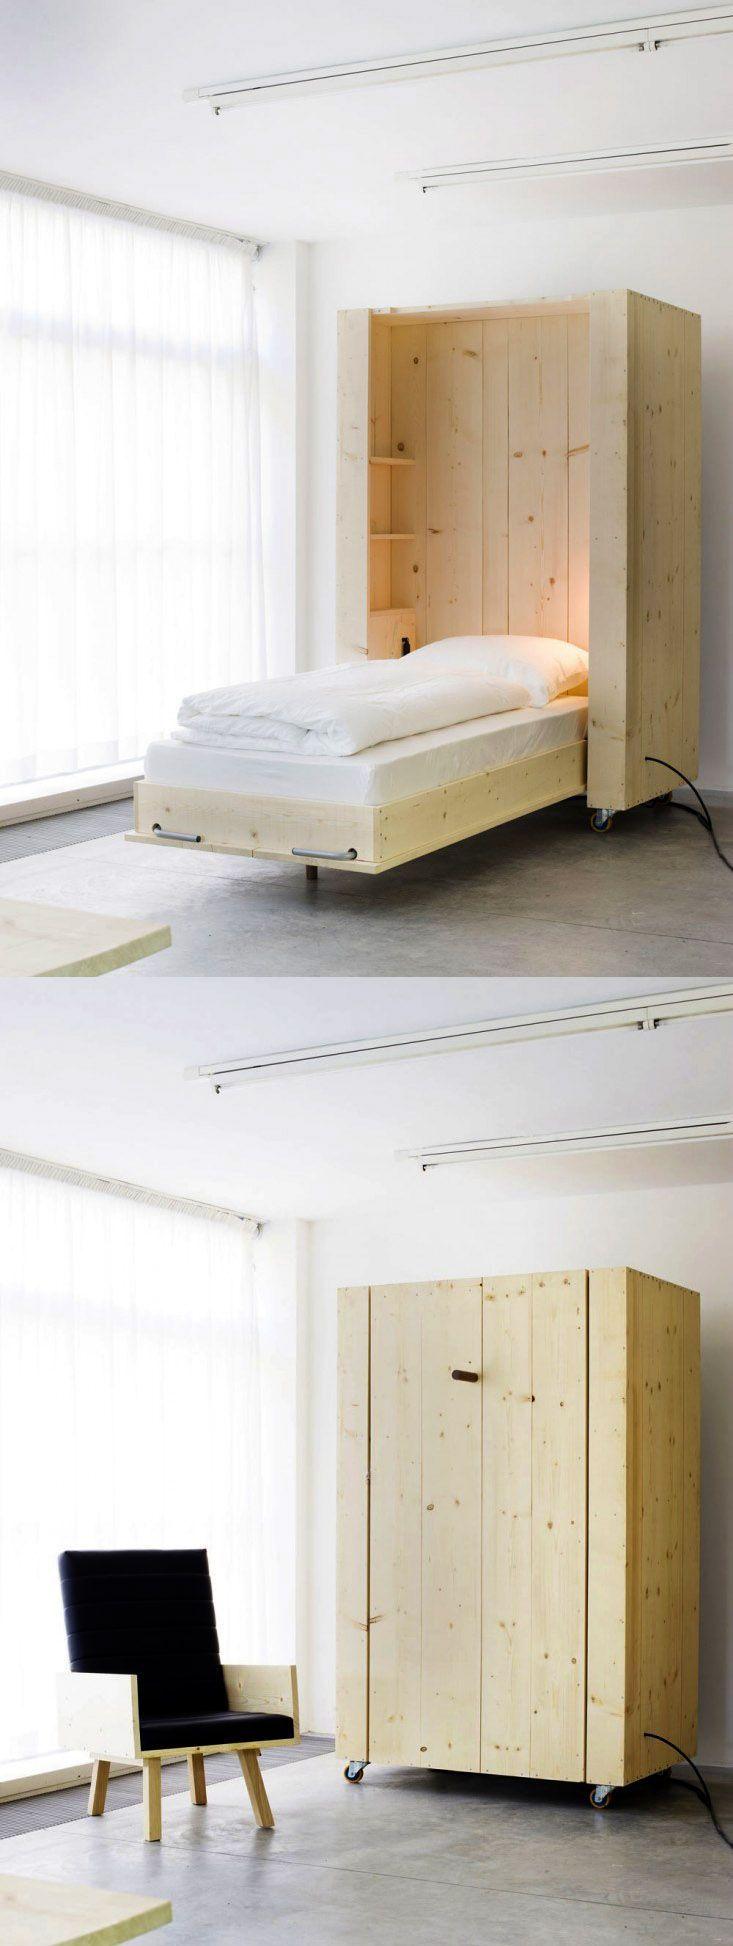 25 melhores ideias sobre beliches murphy no pinterest. Black Bedroom Furniture Sets. Home Design Ideas